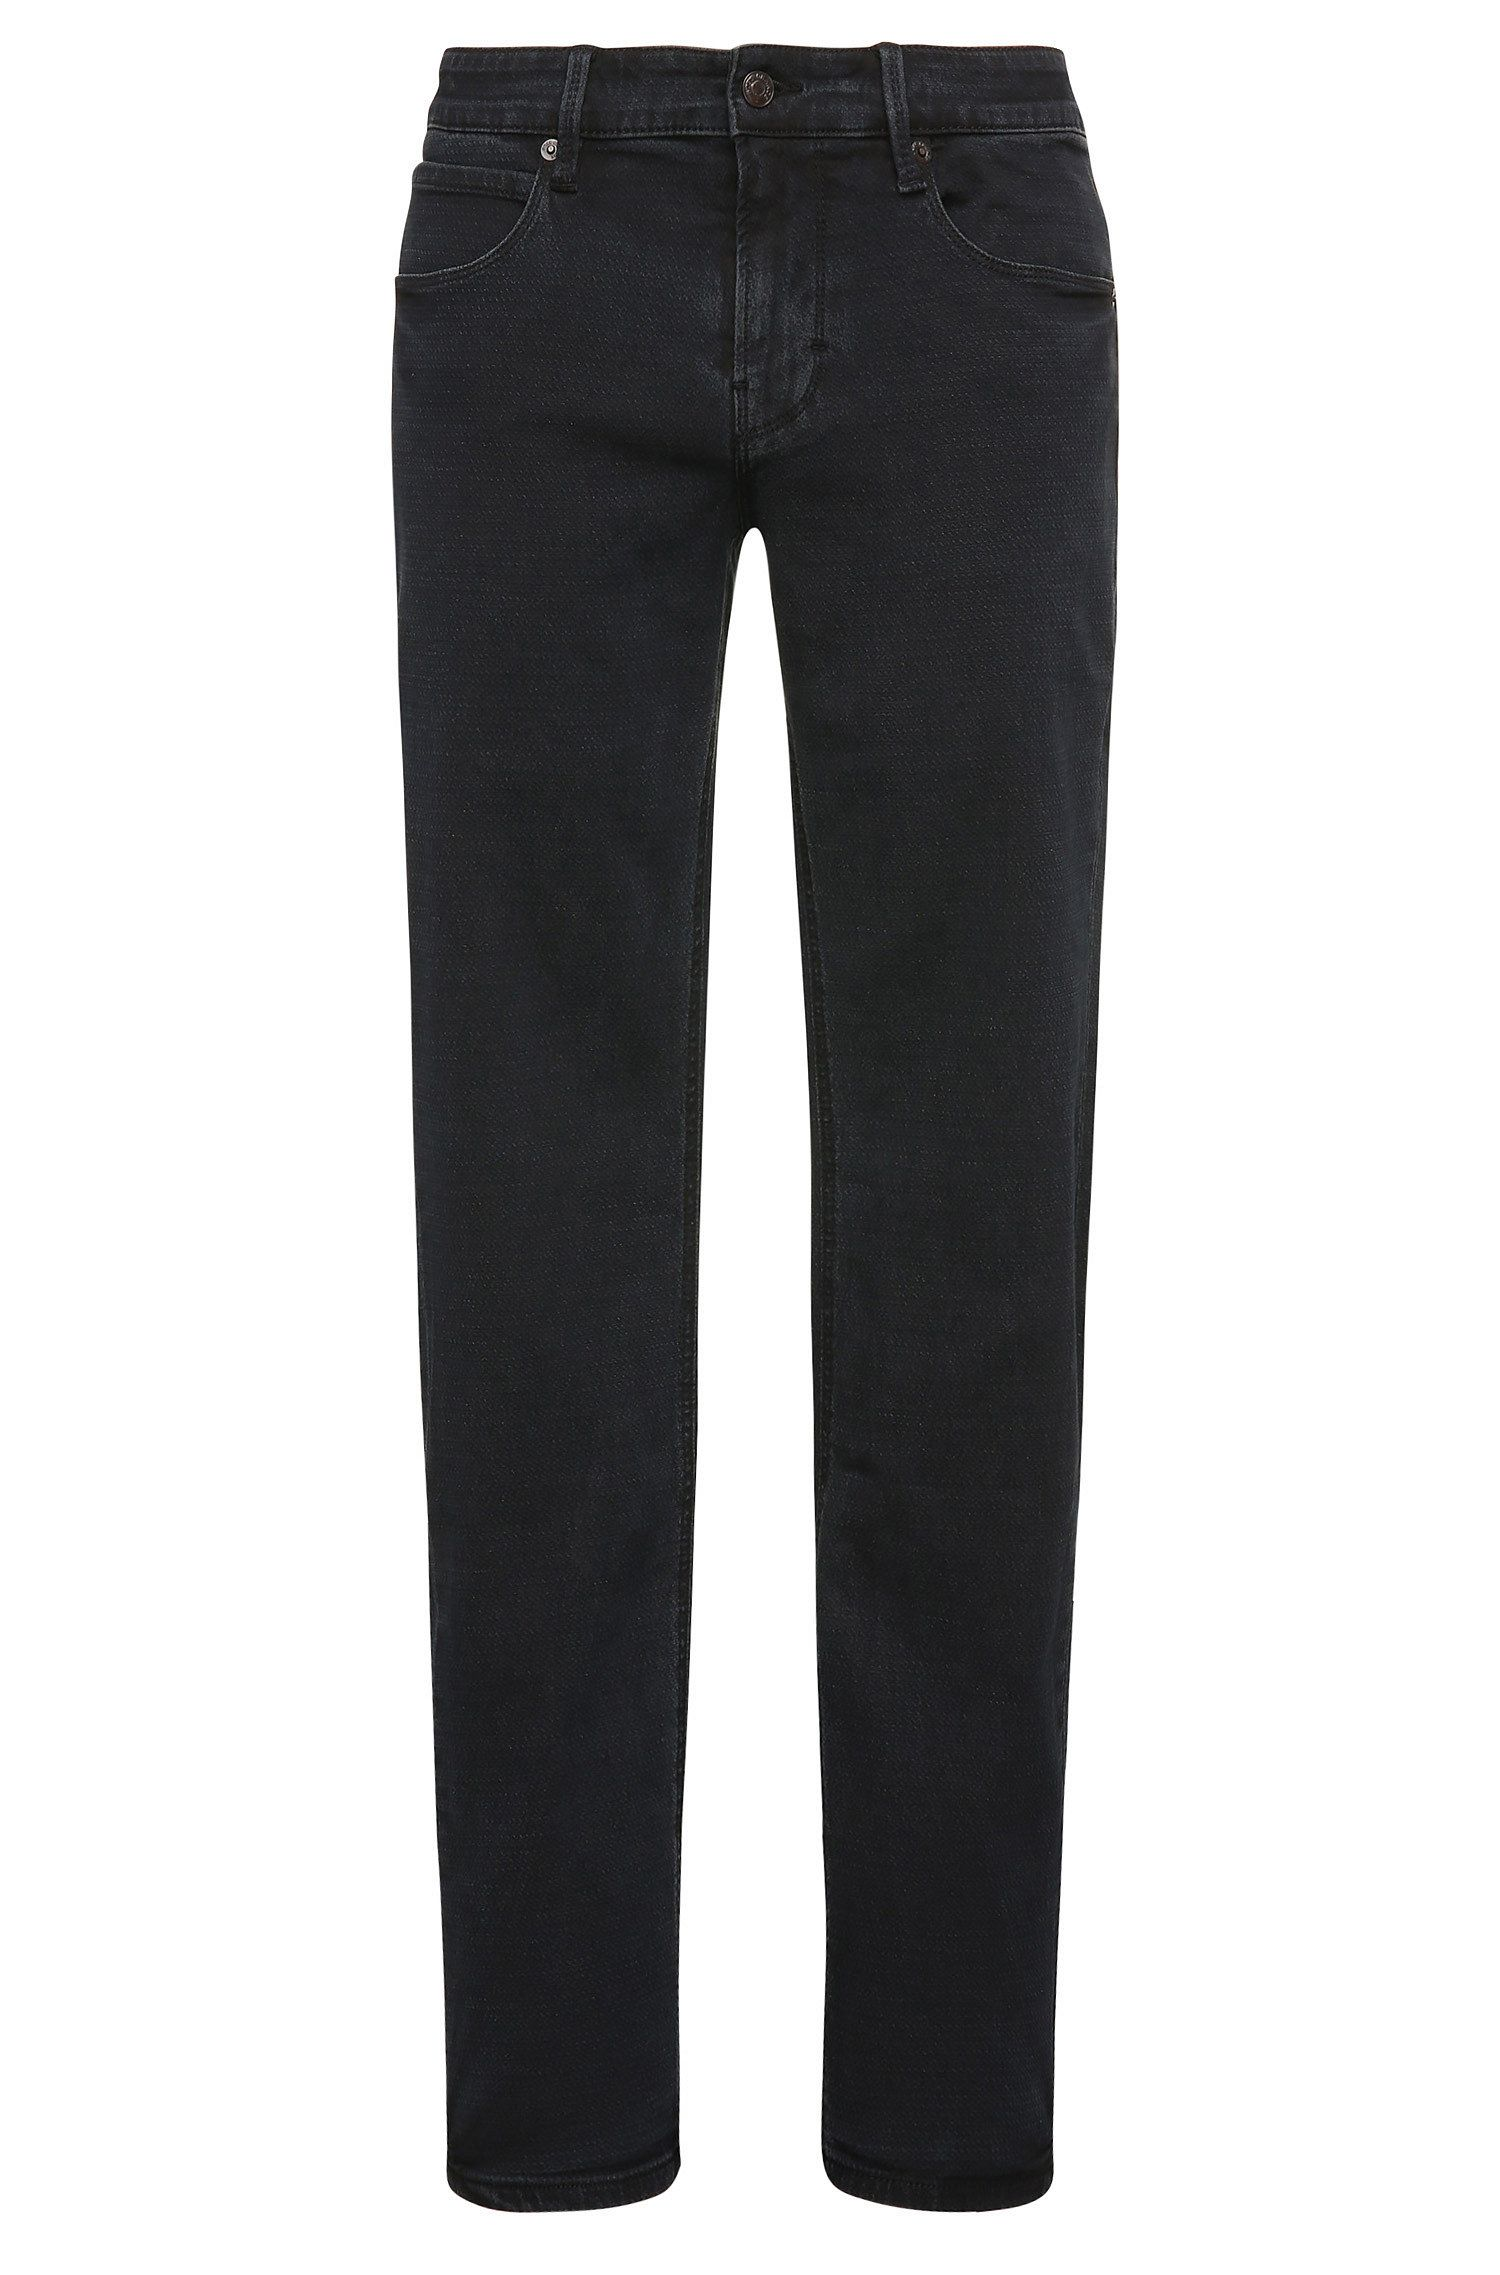 'Orange 63' | Slim Fit, 9 oz Stretch Cotton Blend Jeans